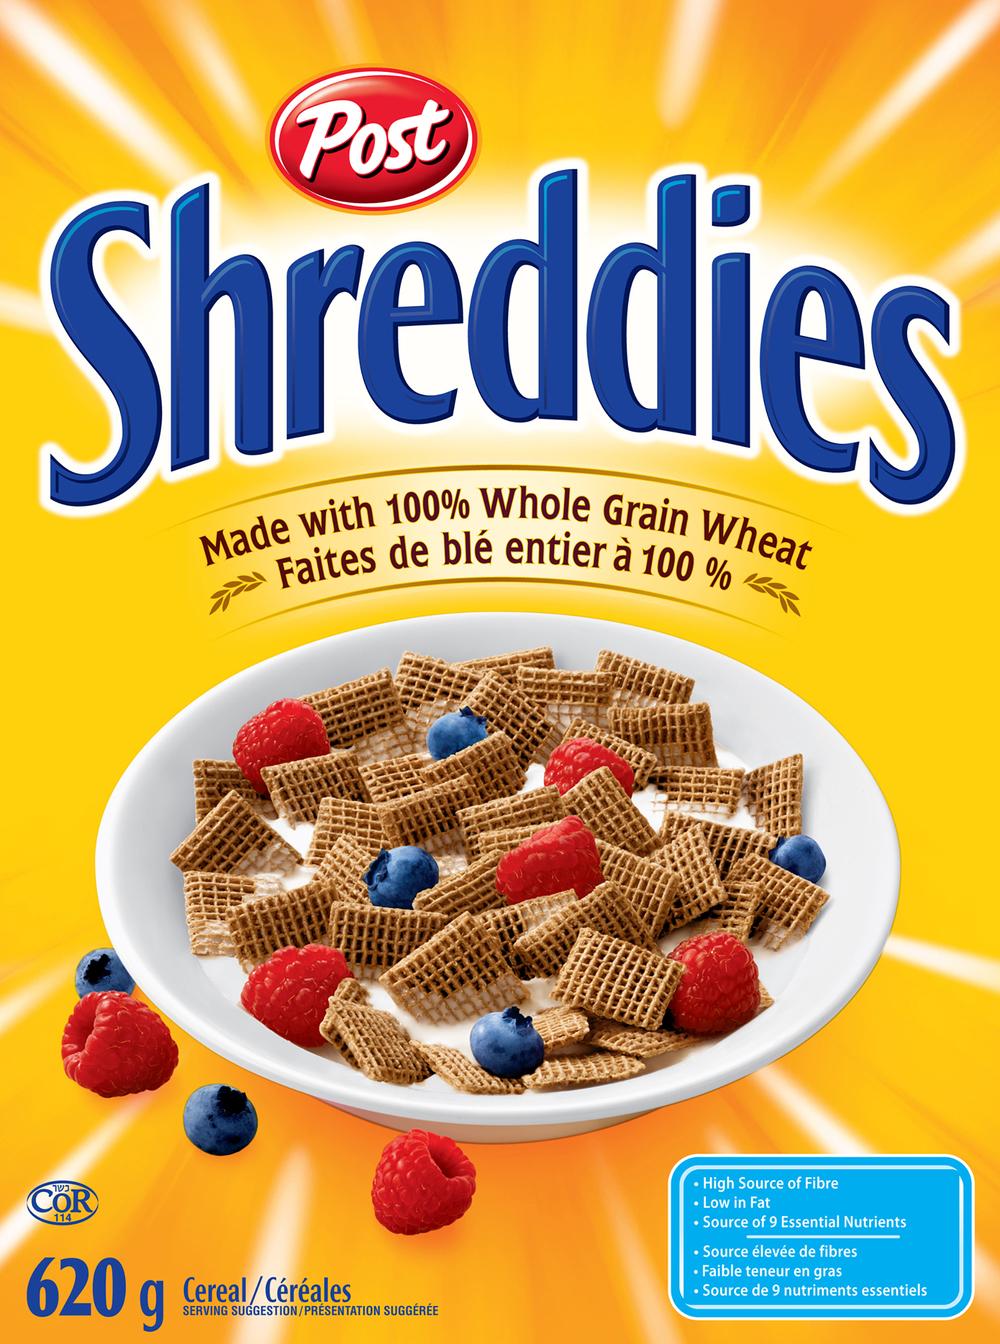 ShreddiesCore.jpg